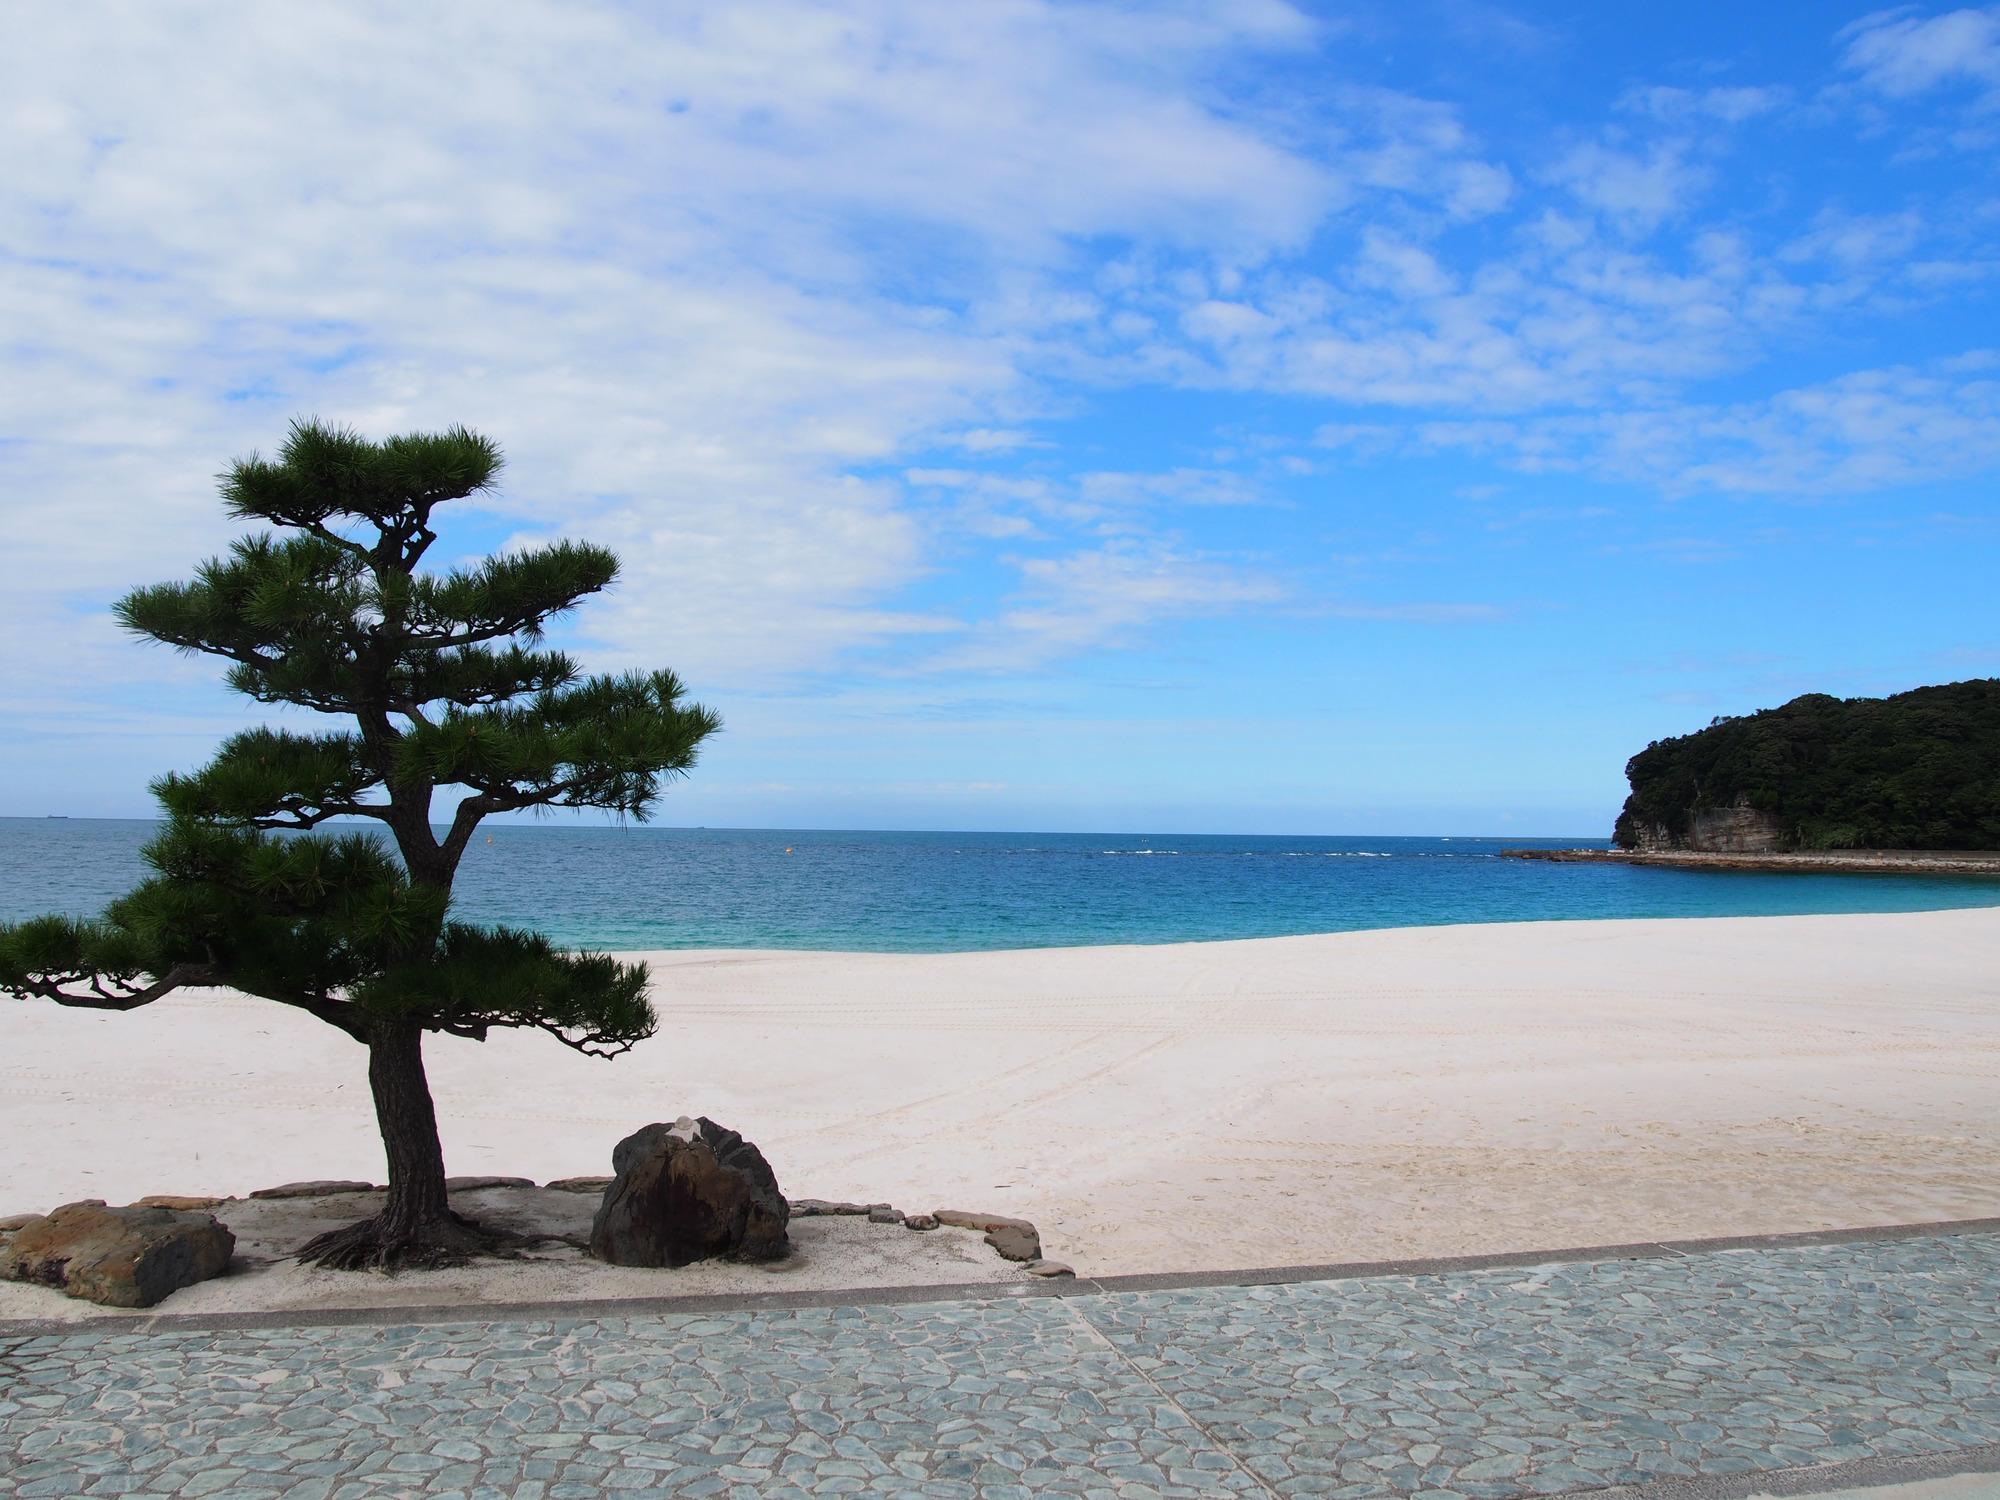 6. Shirahama Onsen